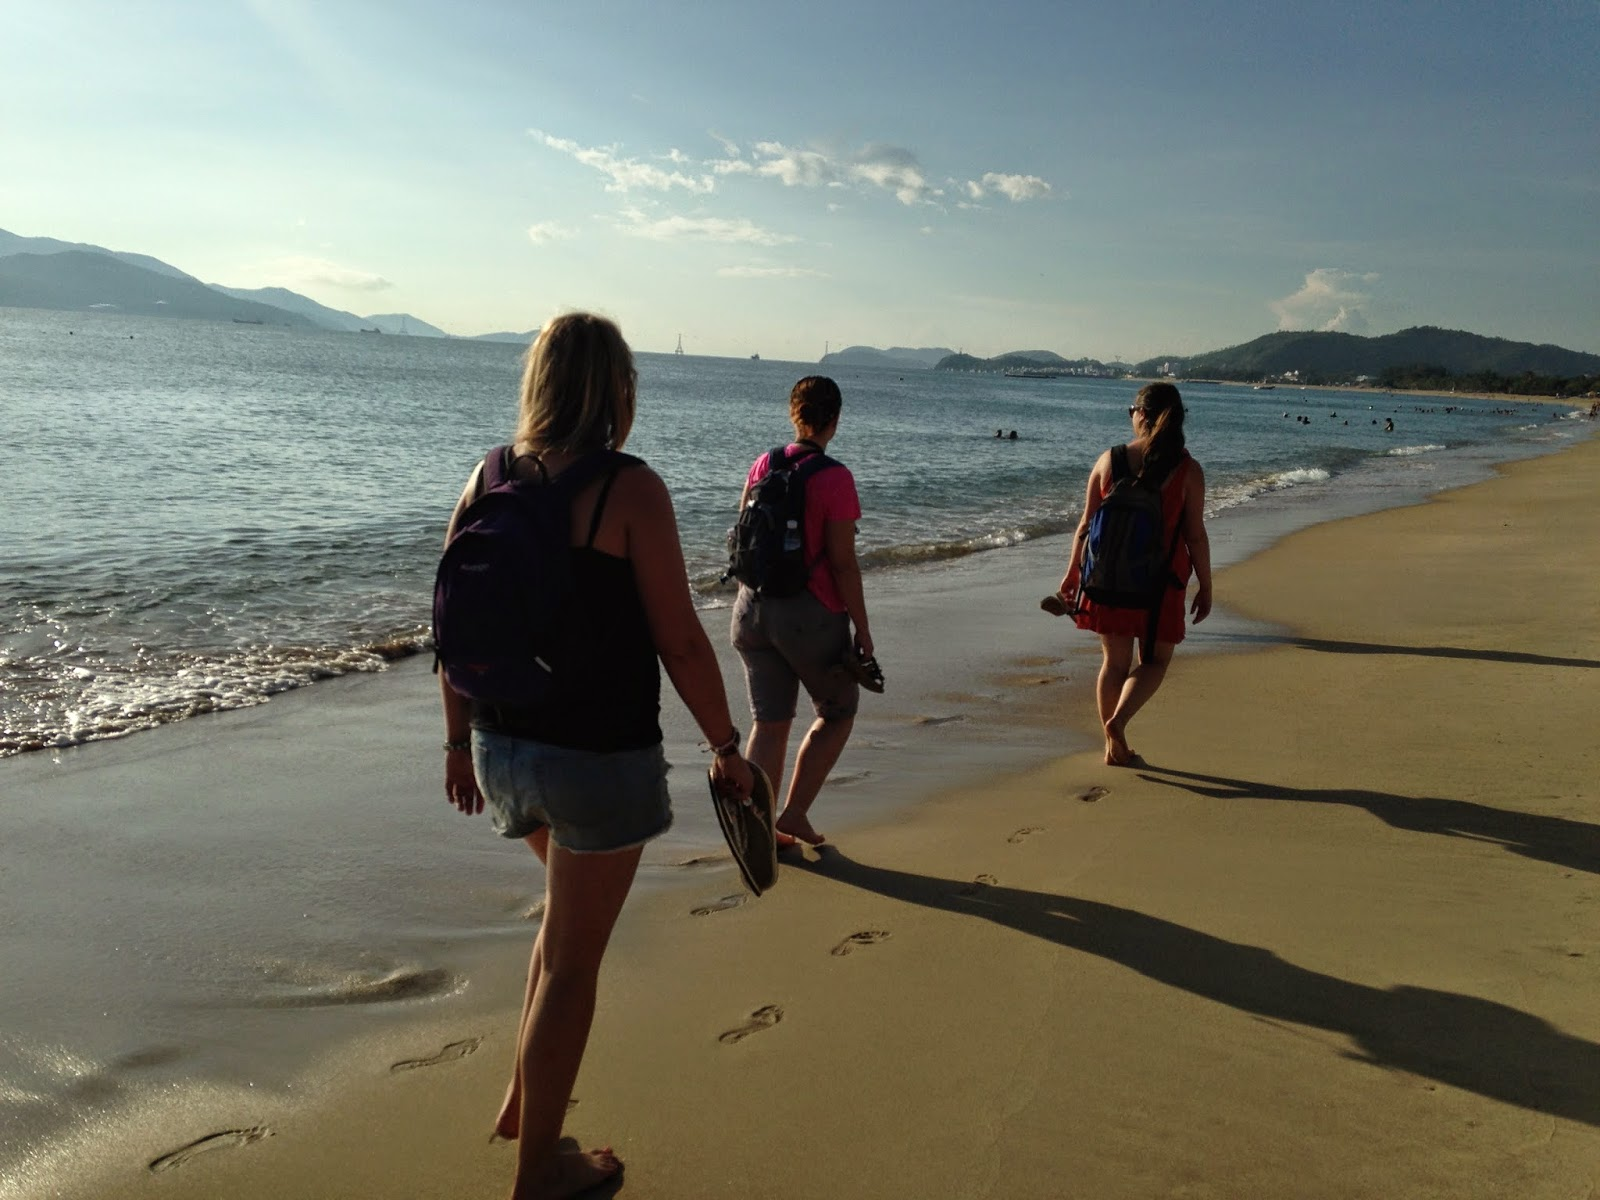 ProjectMVietnam | Nha Trang - The Wong Blog